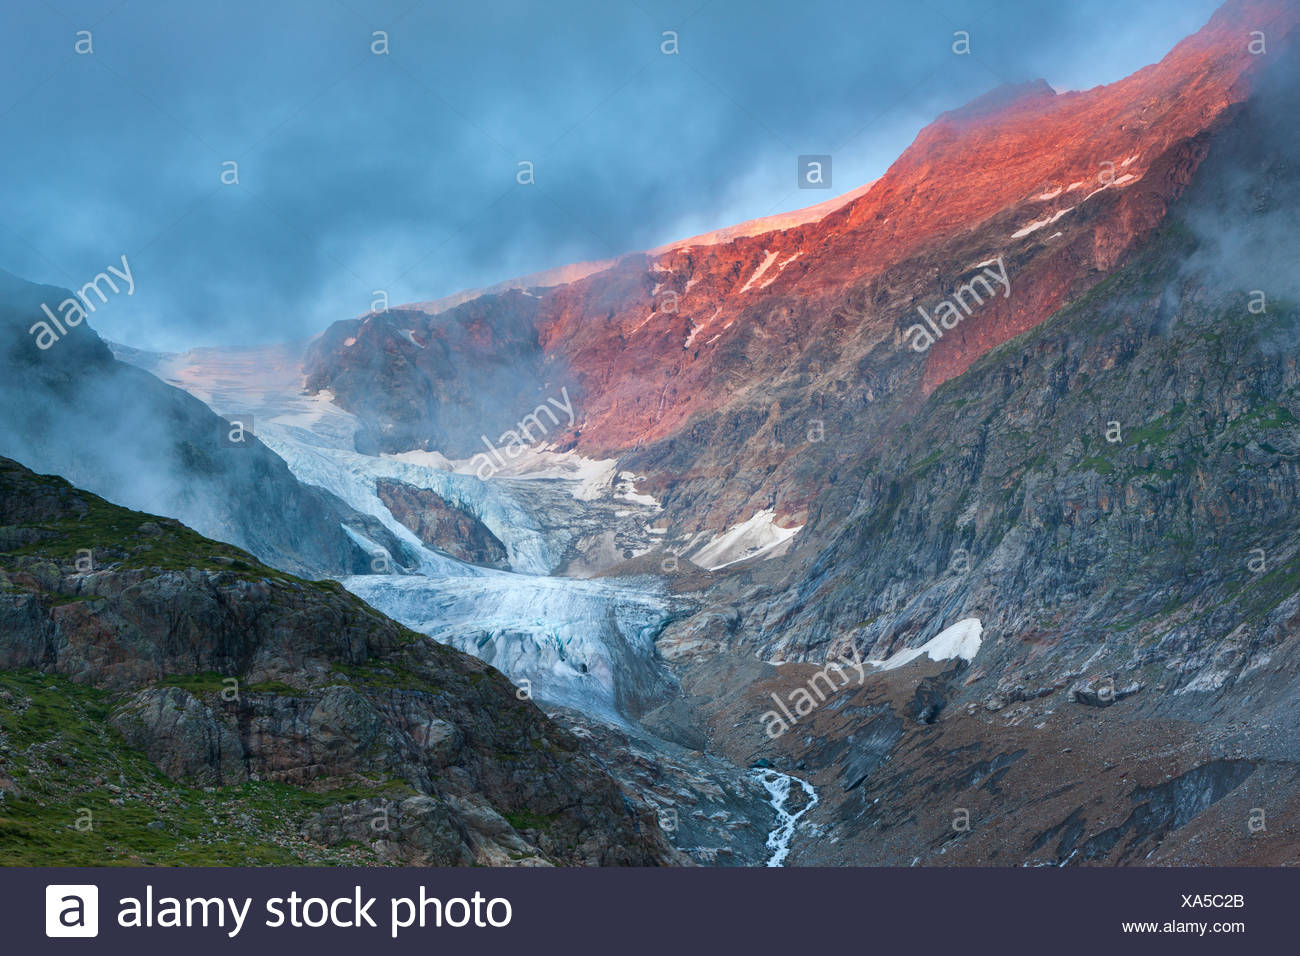 Stone glacier, Switzerland, Europe, canton, Bern, Bernese Oberland, Gadmental, glacier, ice, rock, cliff, evening light - Stock Image